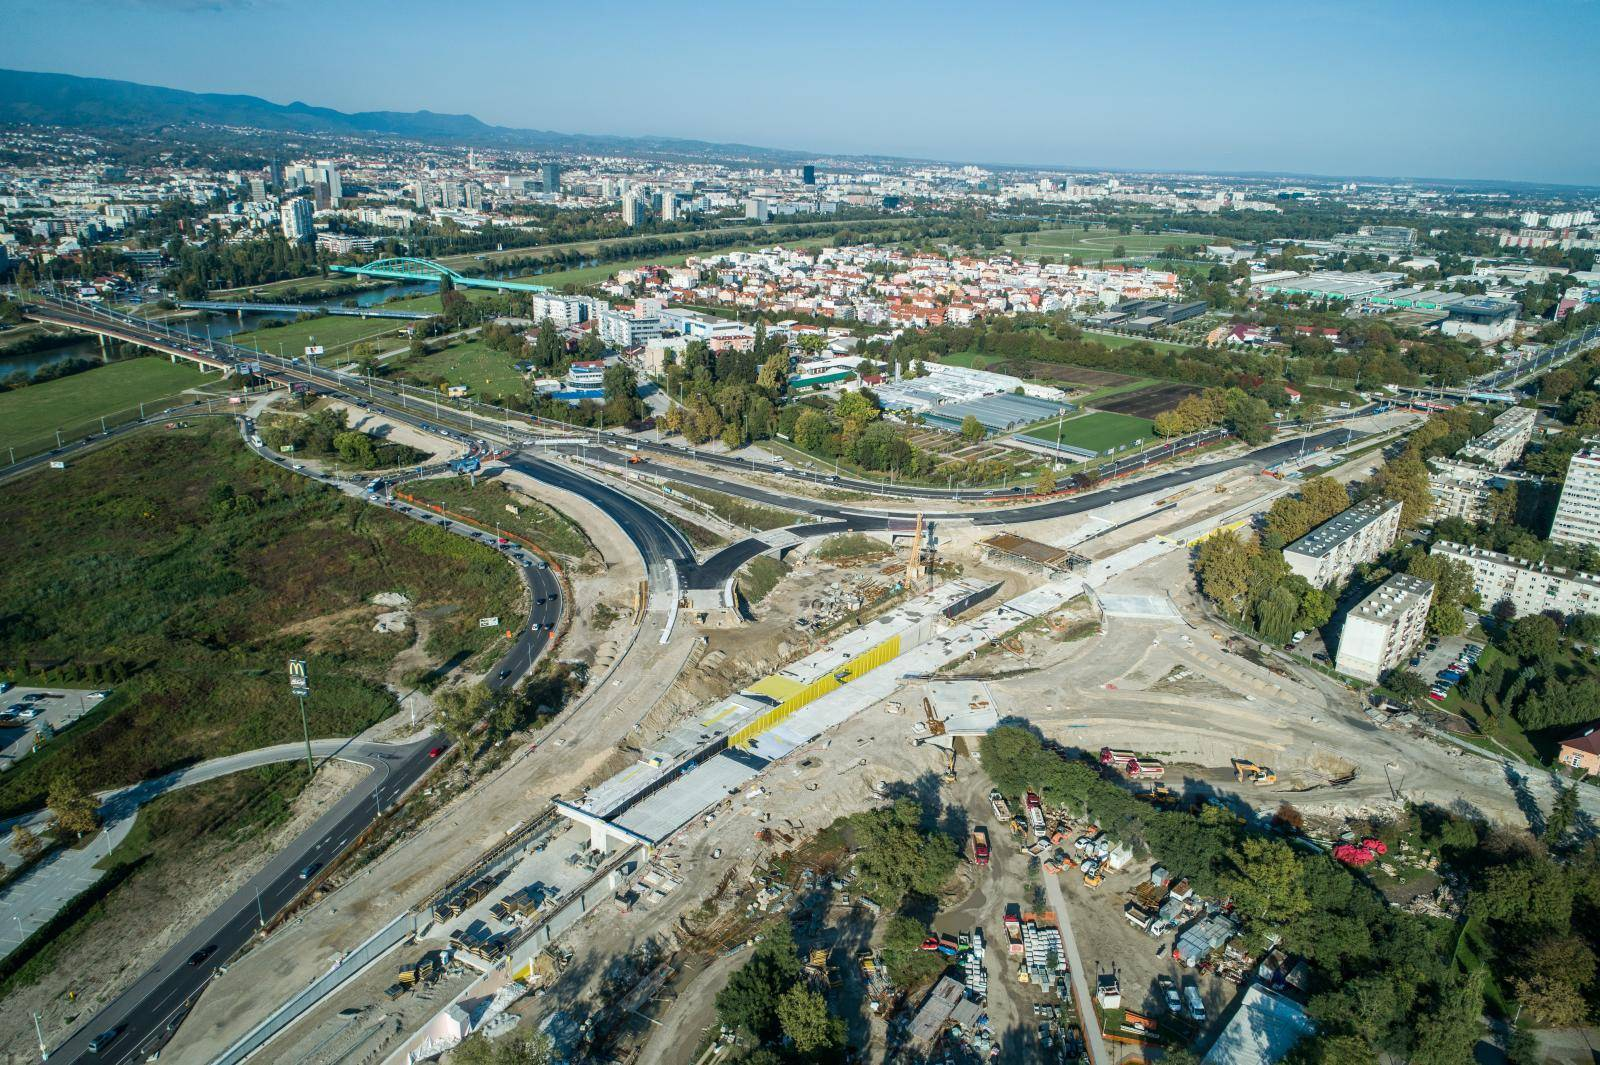 Fotografije iz zraka: Polako se vide obrisi zagrebačkog rotora